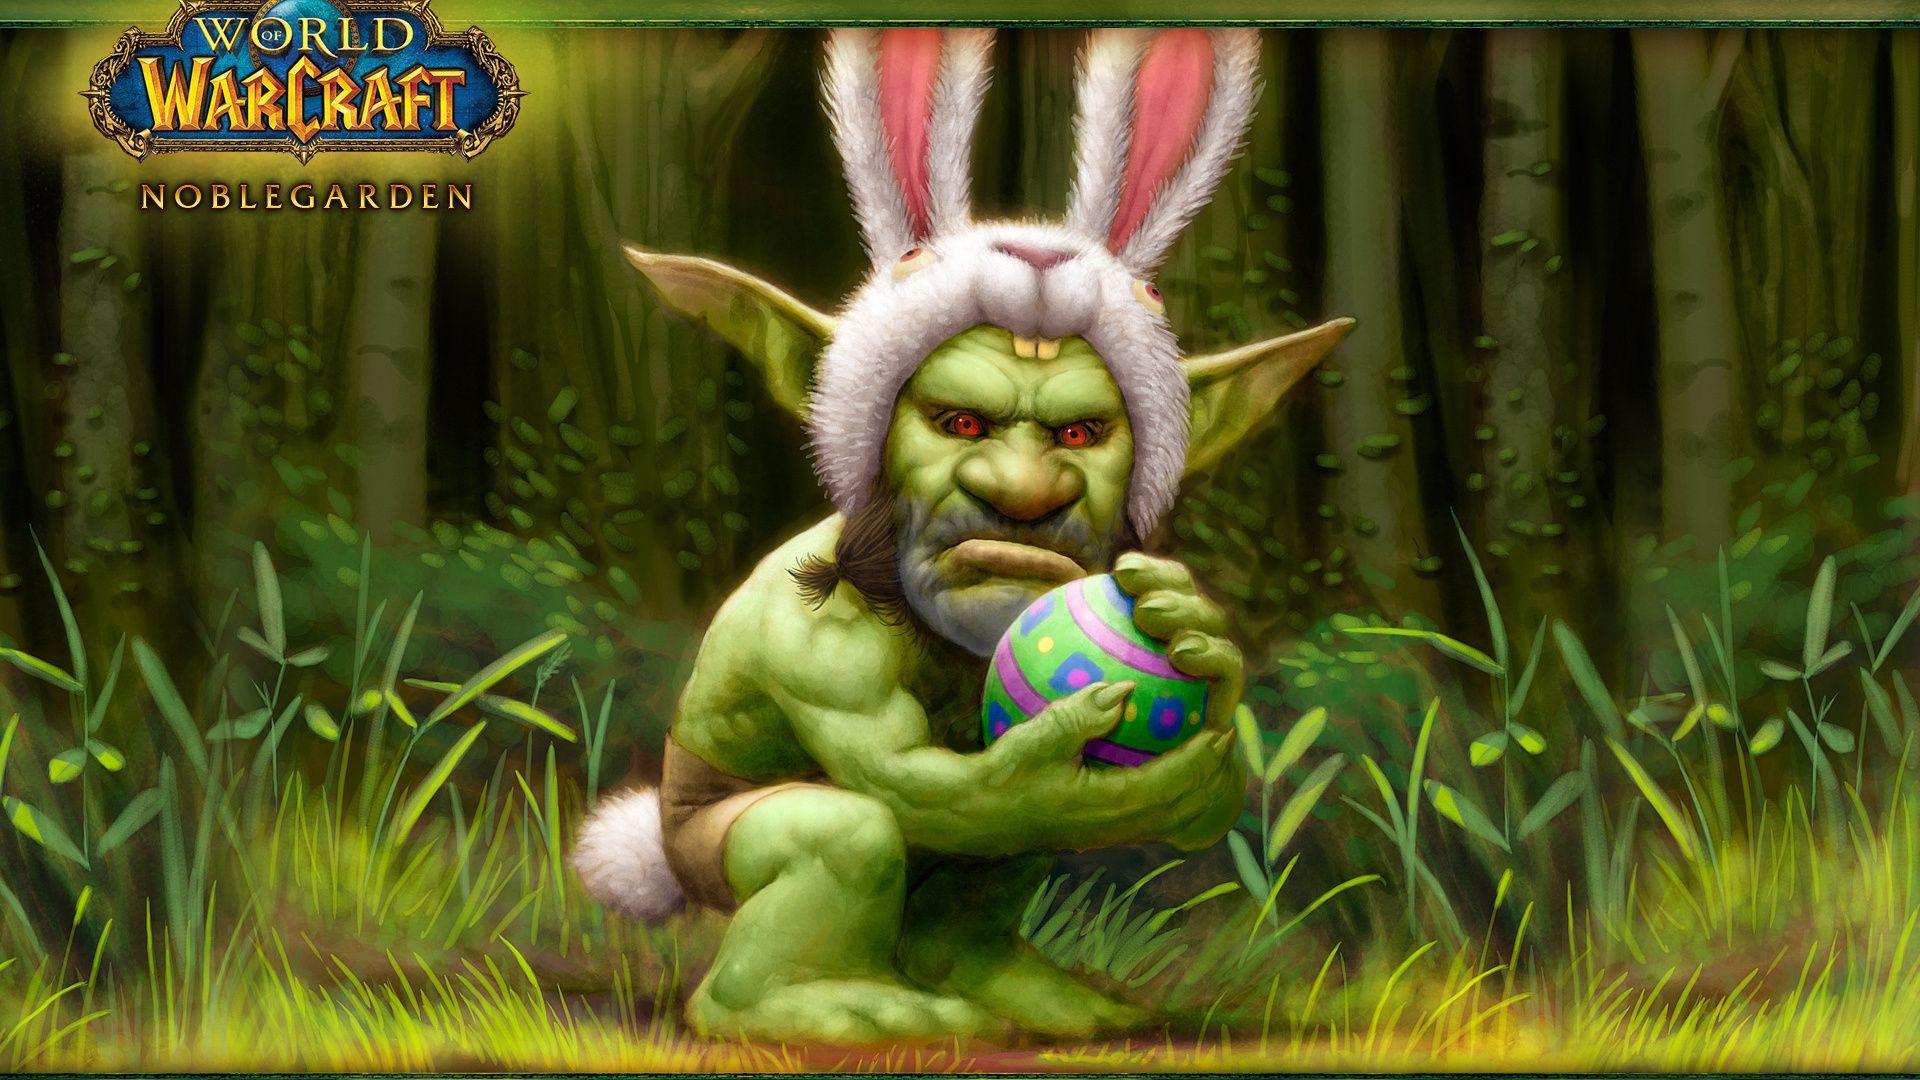 Rabbit, Egg, World Of Warcraft, Orc, Easter